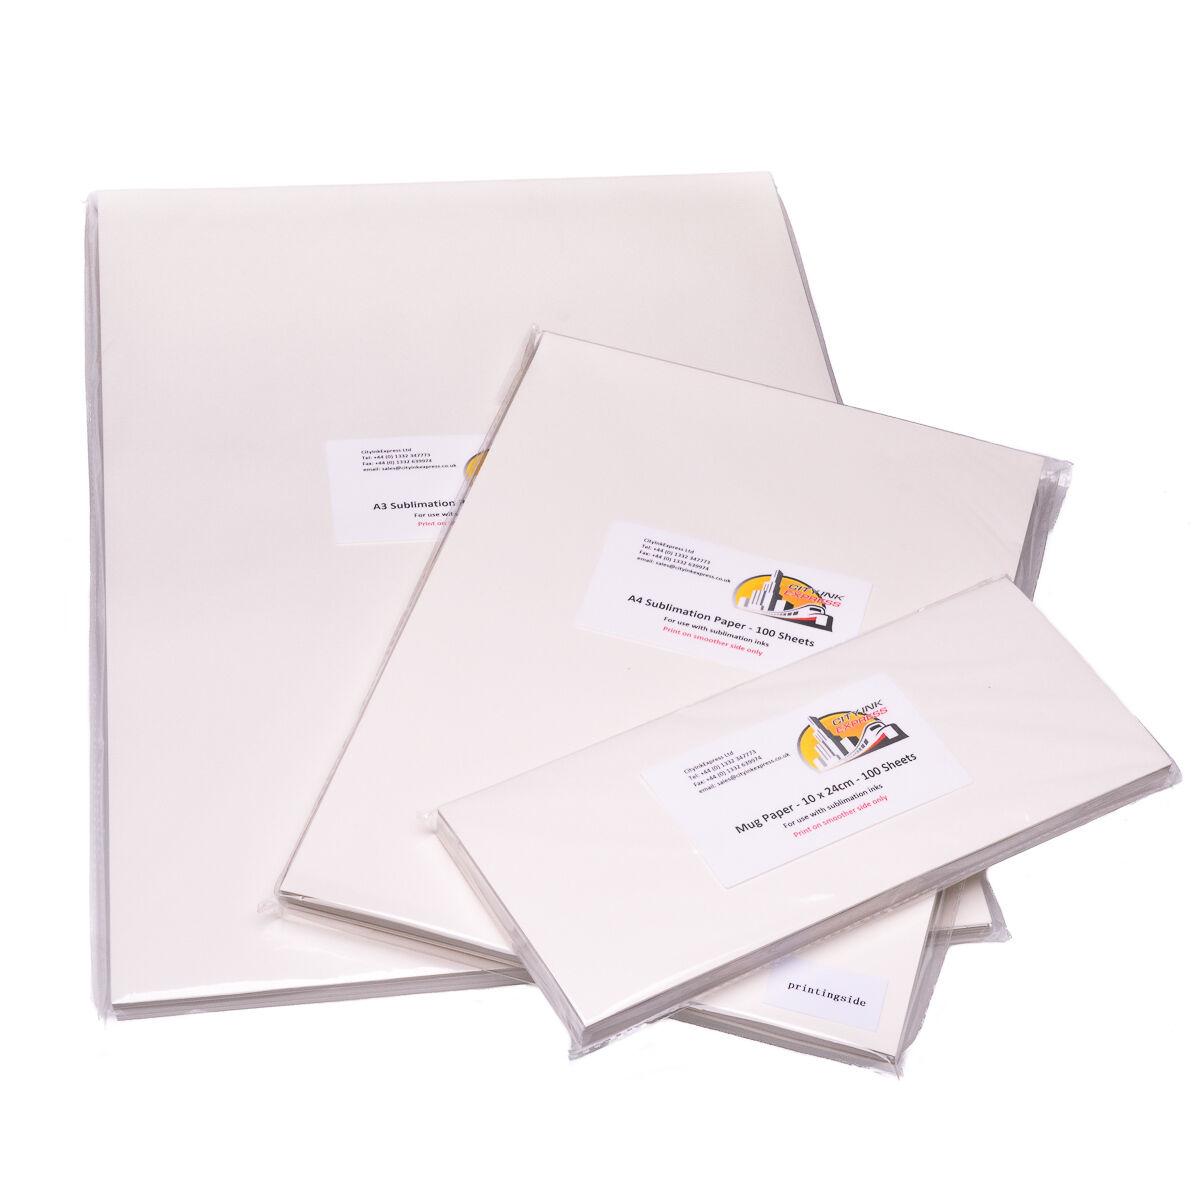 Dye Sublimation Paper for Epson WF-2830DWF printer